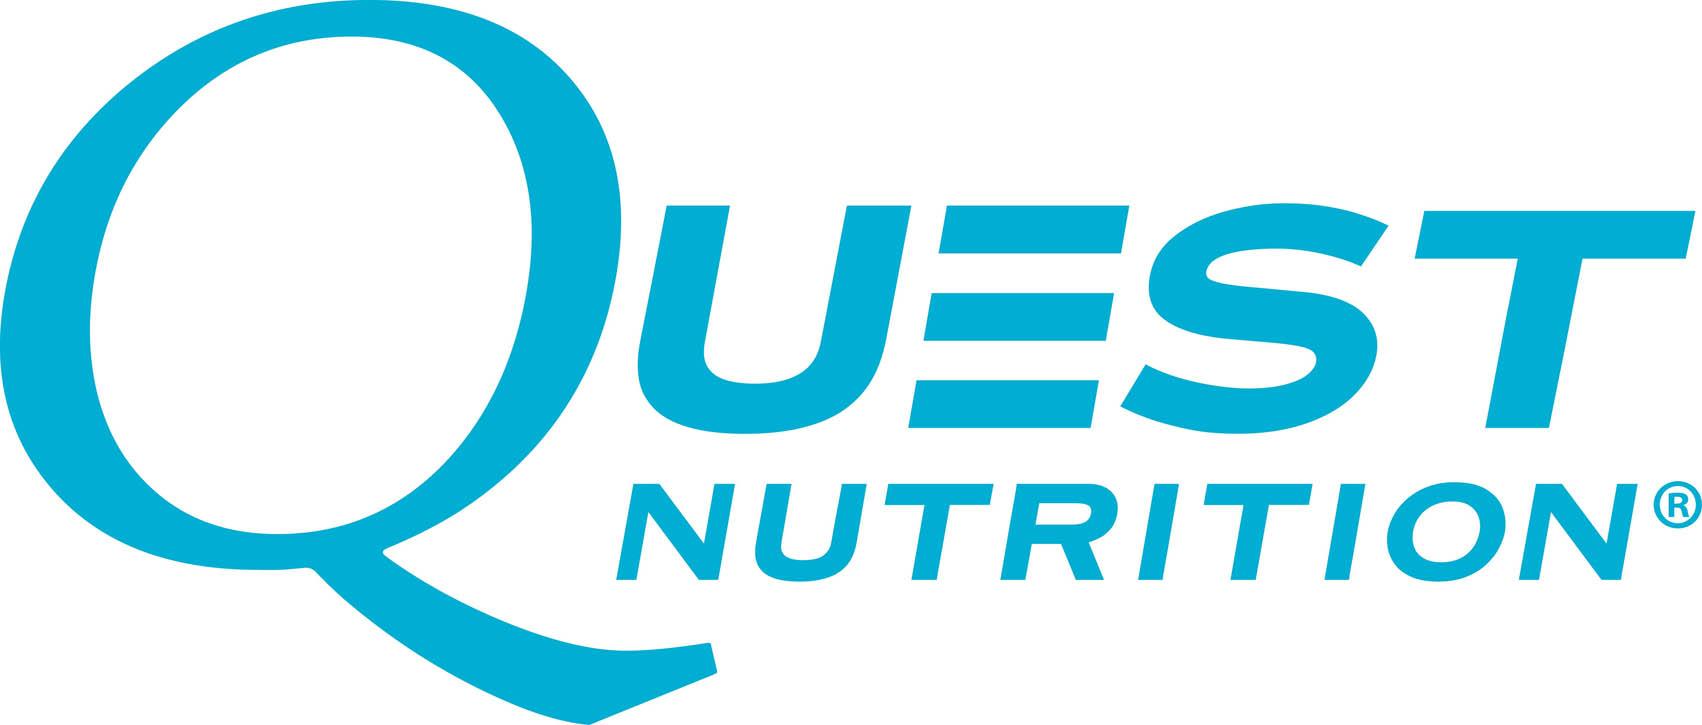 Quest_Nutrition_Logo_2016_Blue_Transparent_Bckgrnd.jpg